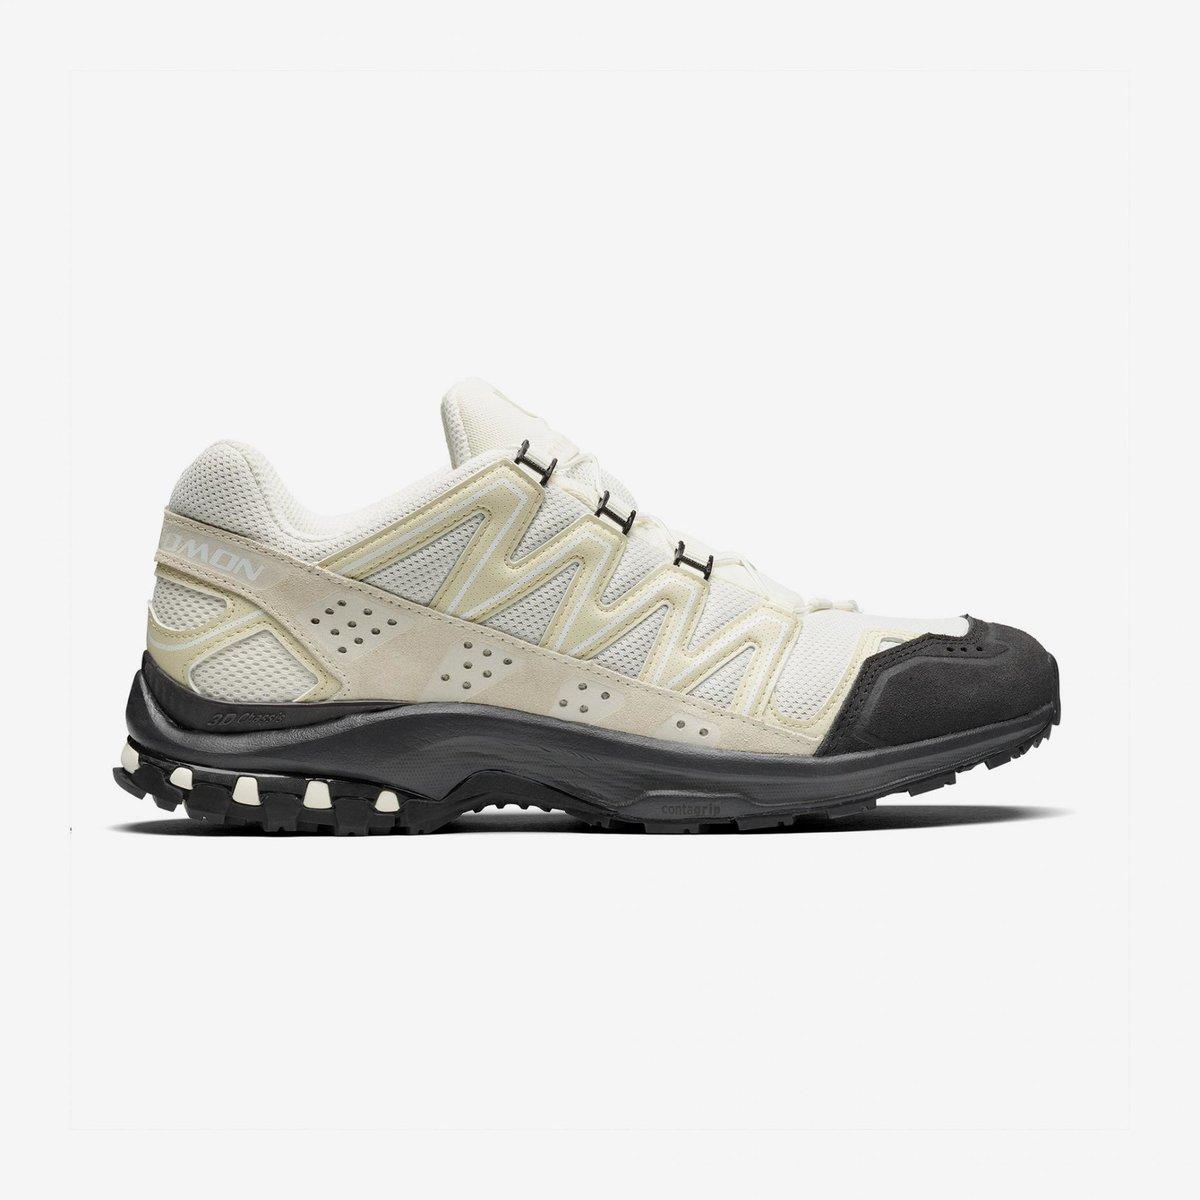 xa-comp-ltr-adv-vanilla-icebleached-sandblack-salomon-trail-running-shoes.jpeg